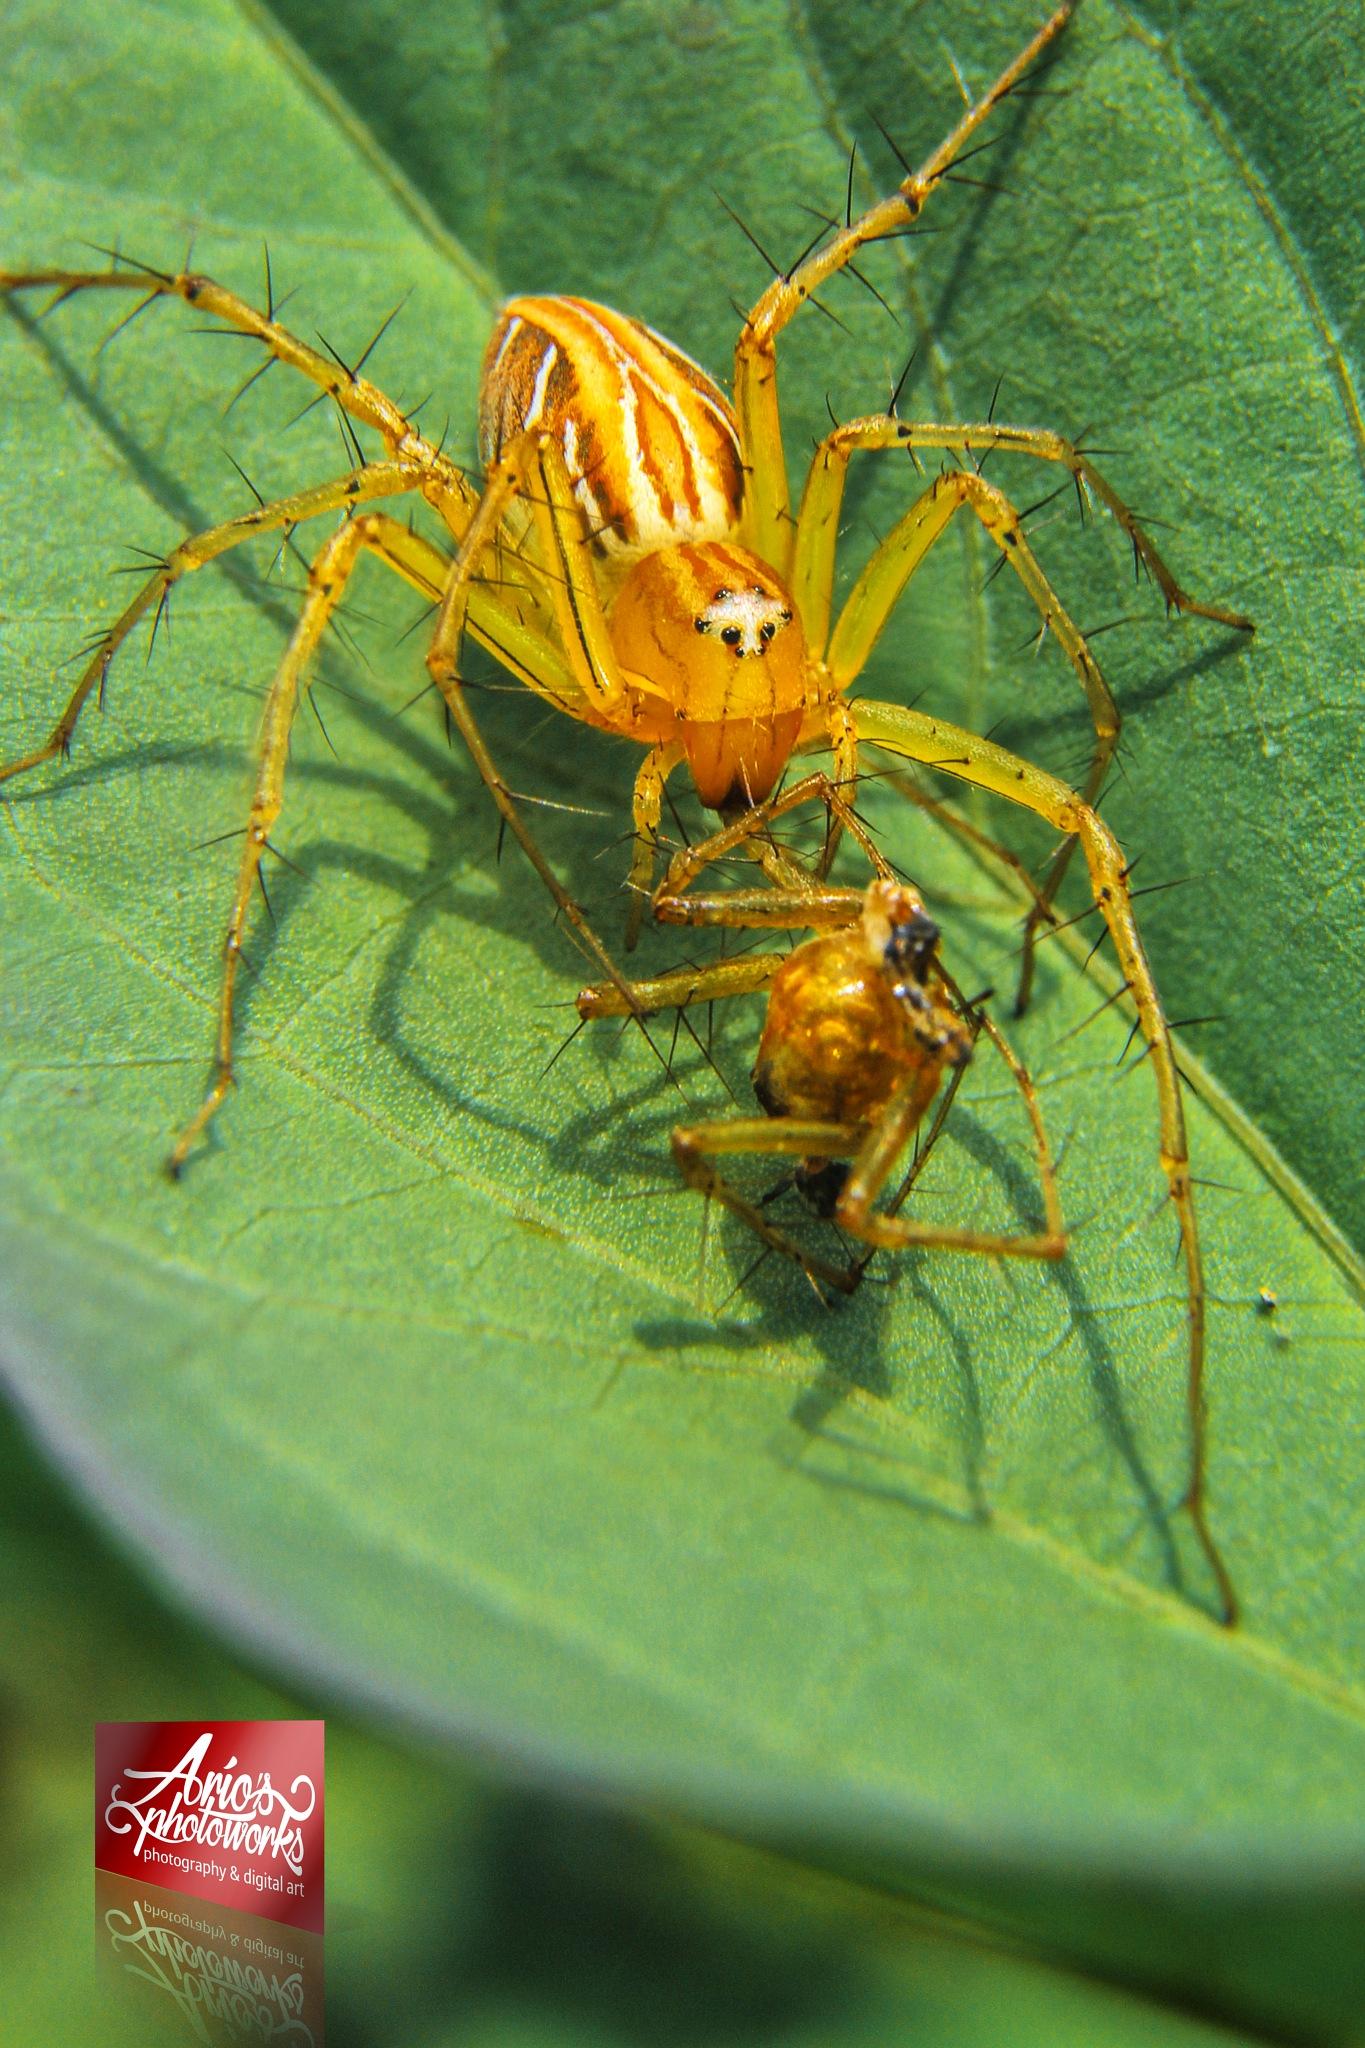 yellow spider by ario photowork